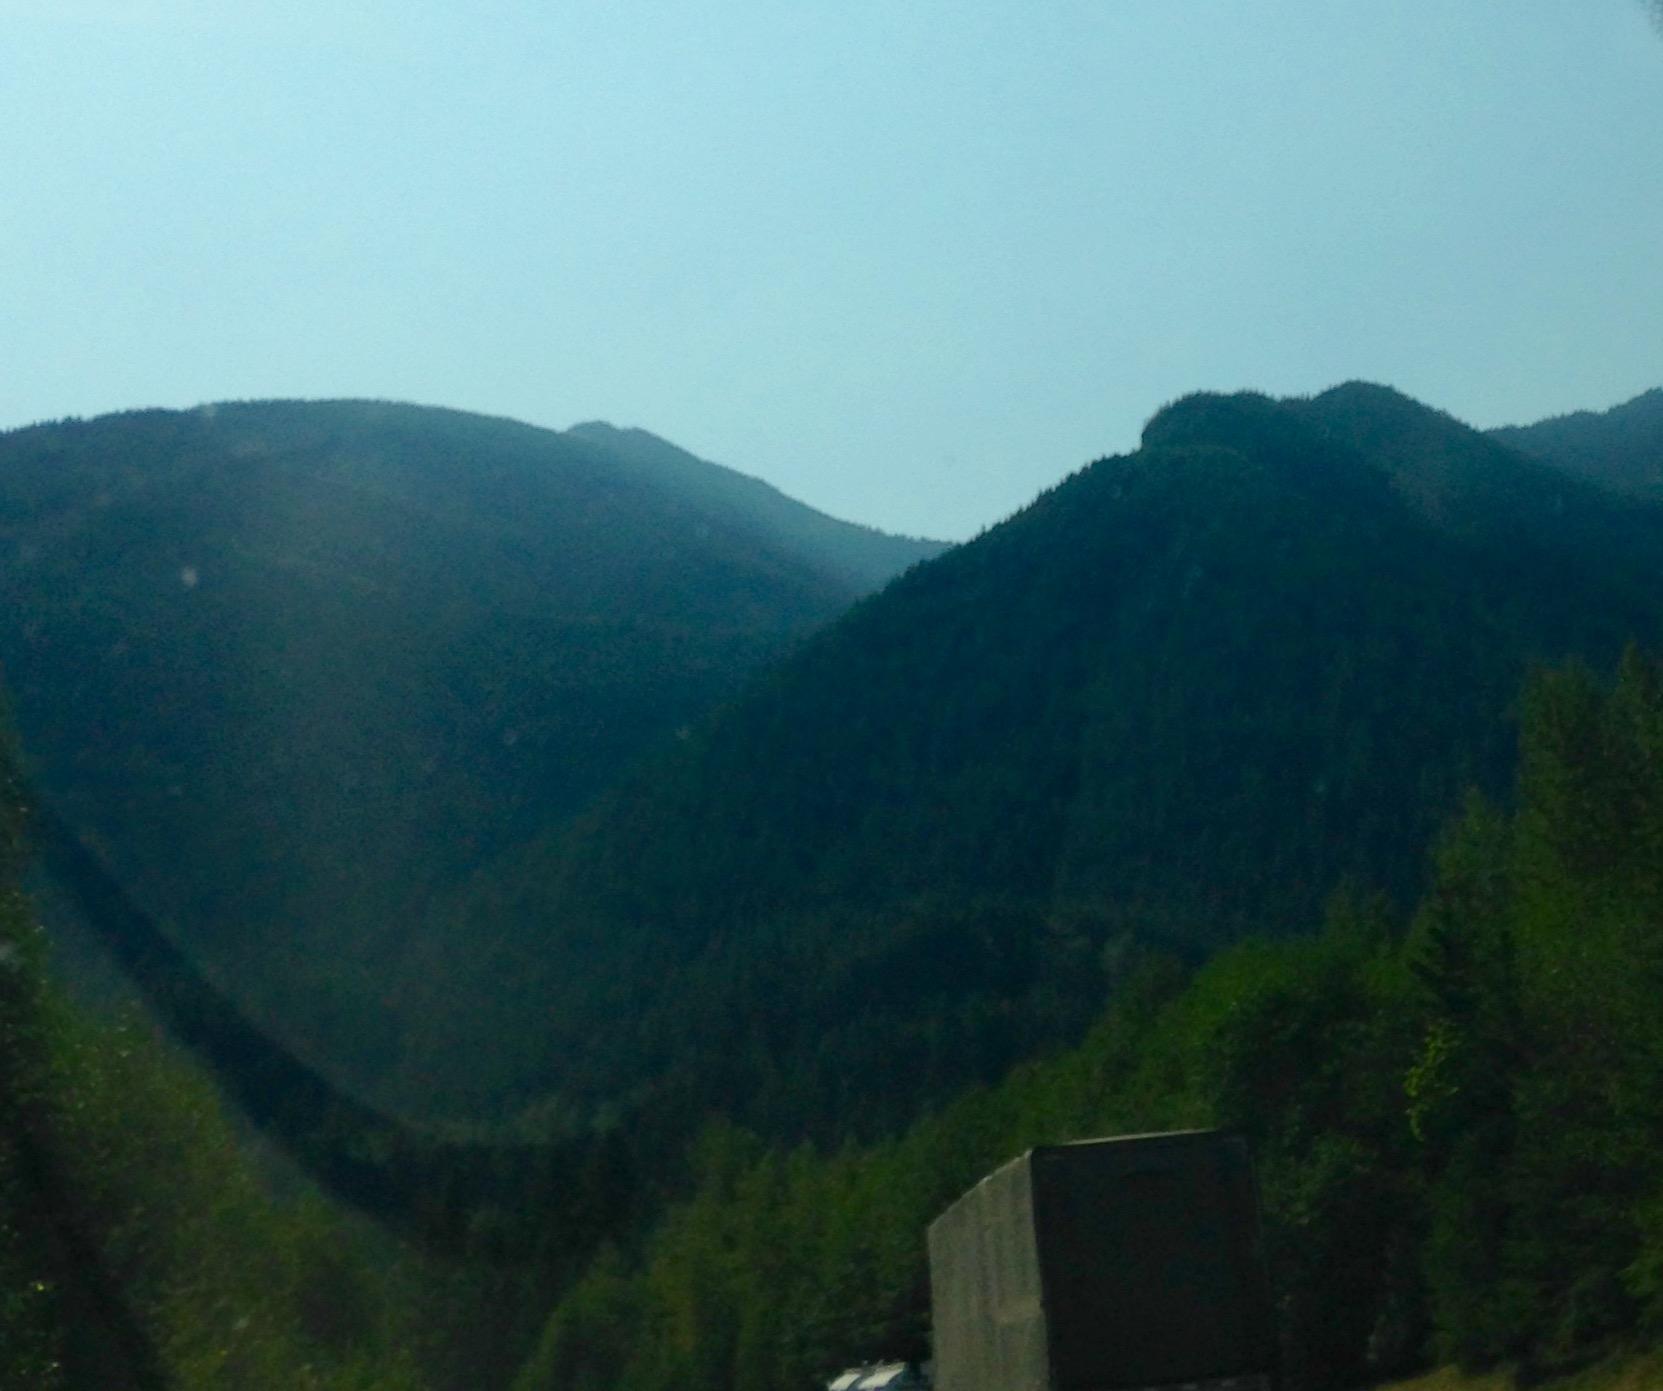 Drive to Spokane Mountainy Hills